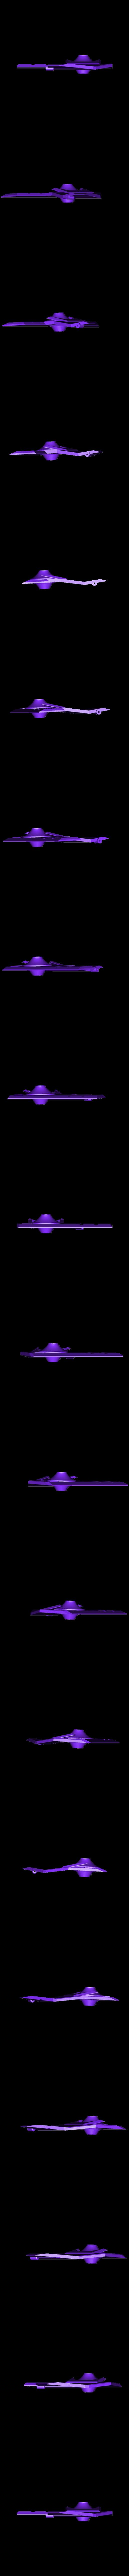 orni_wing_left.stl Download free STL file Dune Ornithopter • 3D print template, poblocki1982